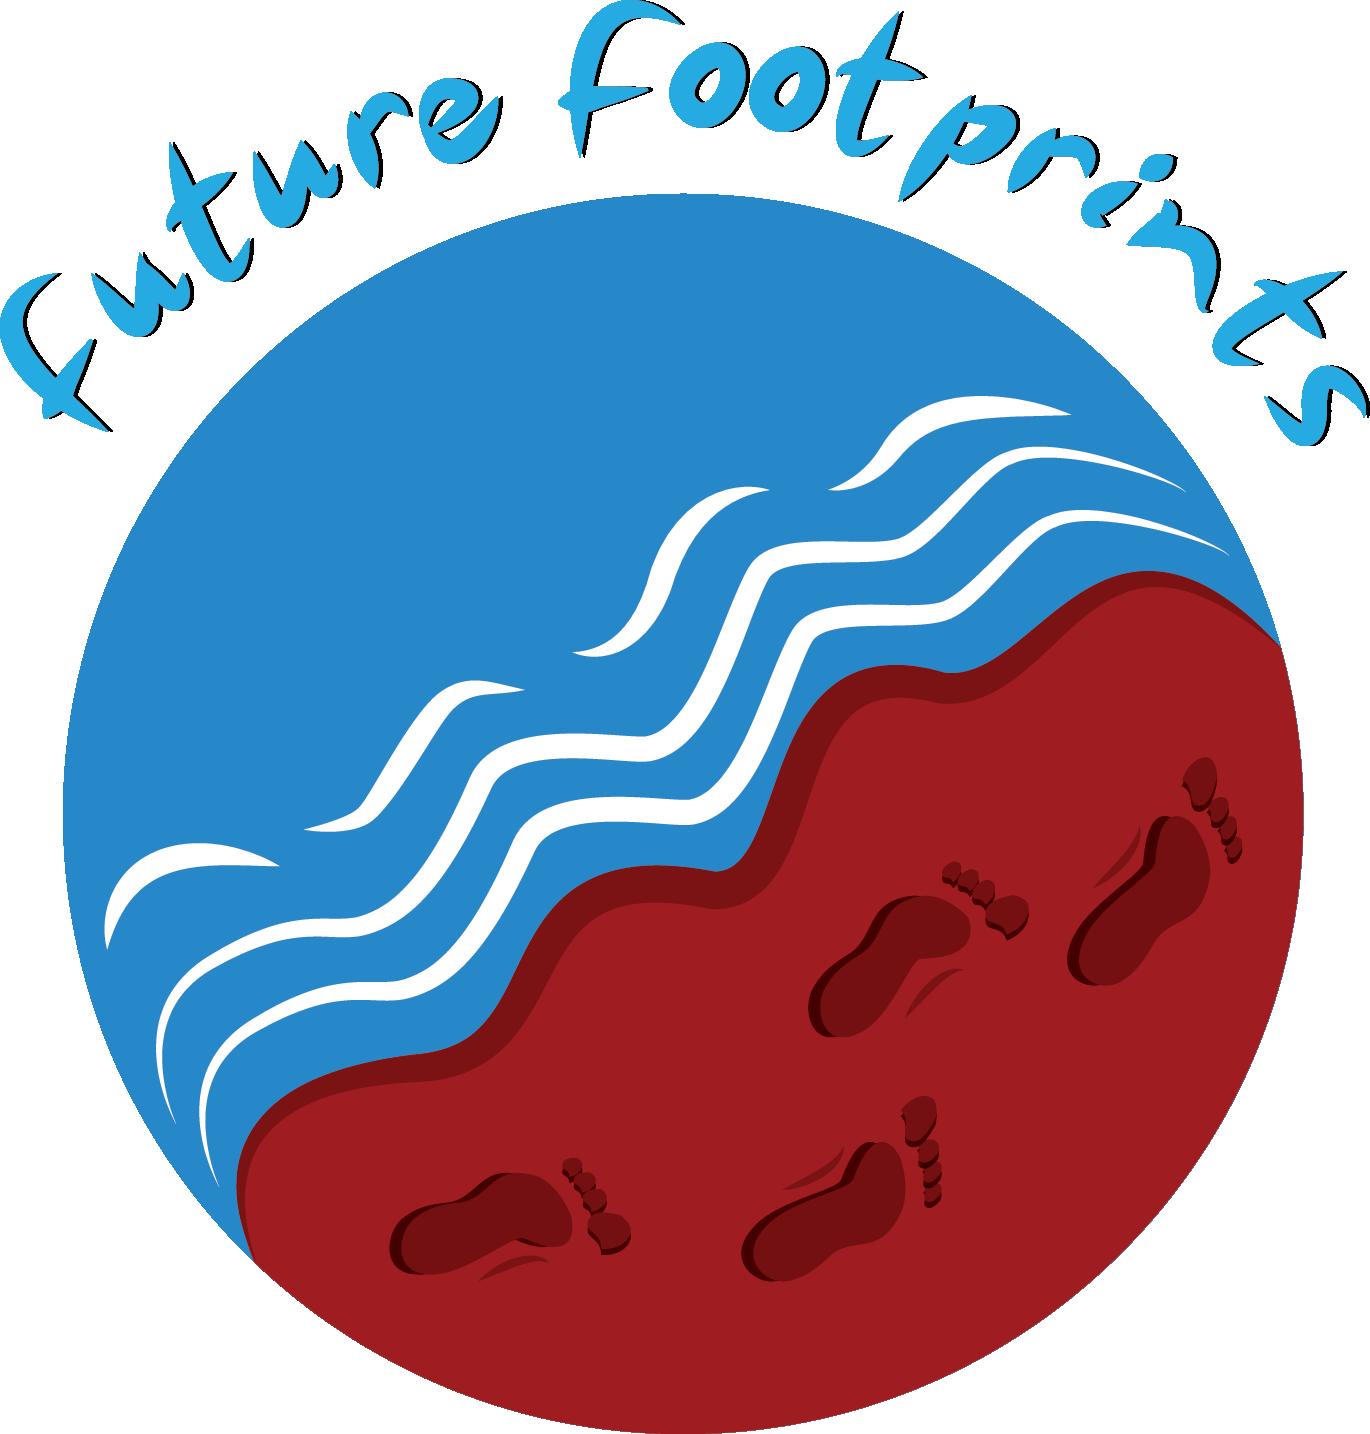 Future Footprints Logo